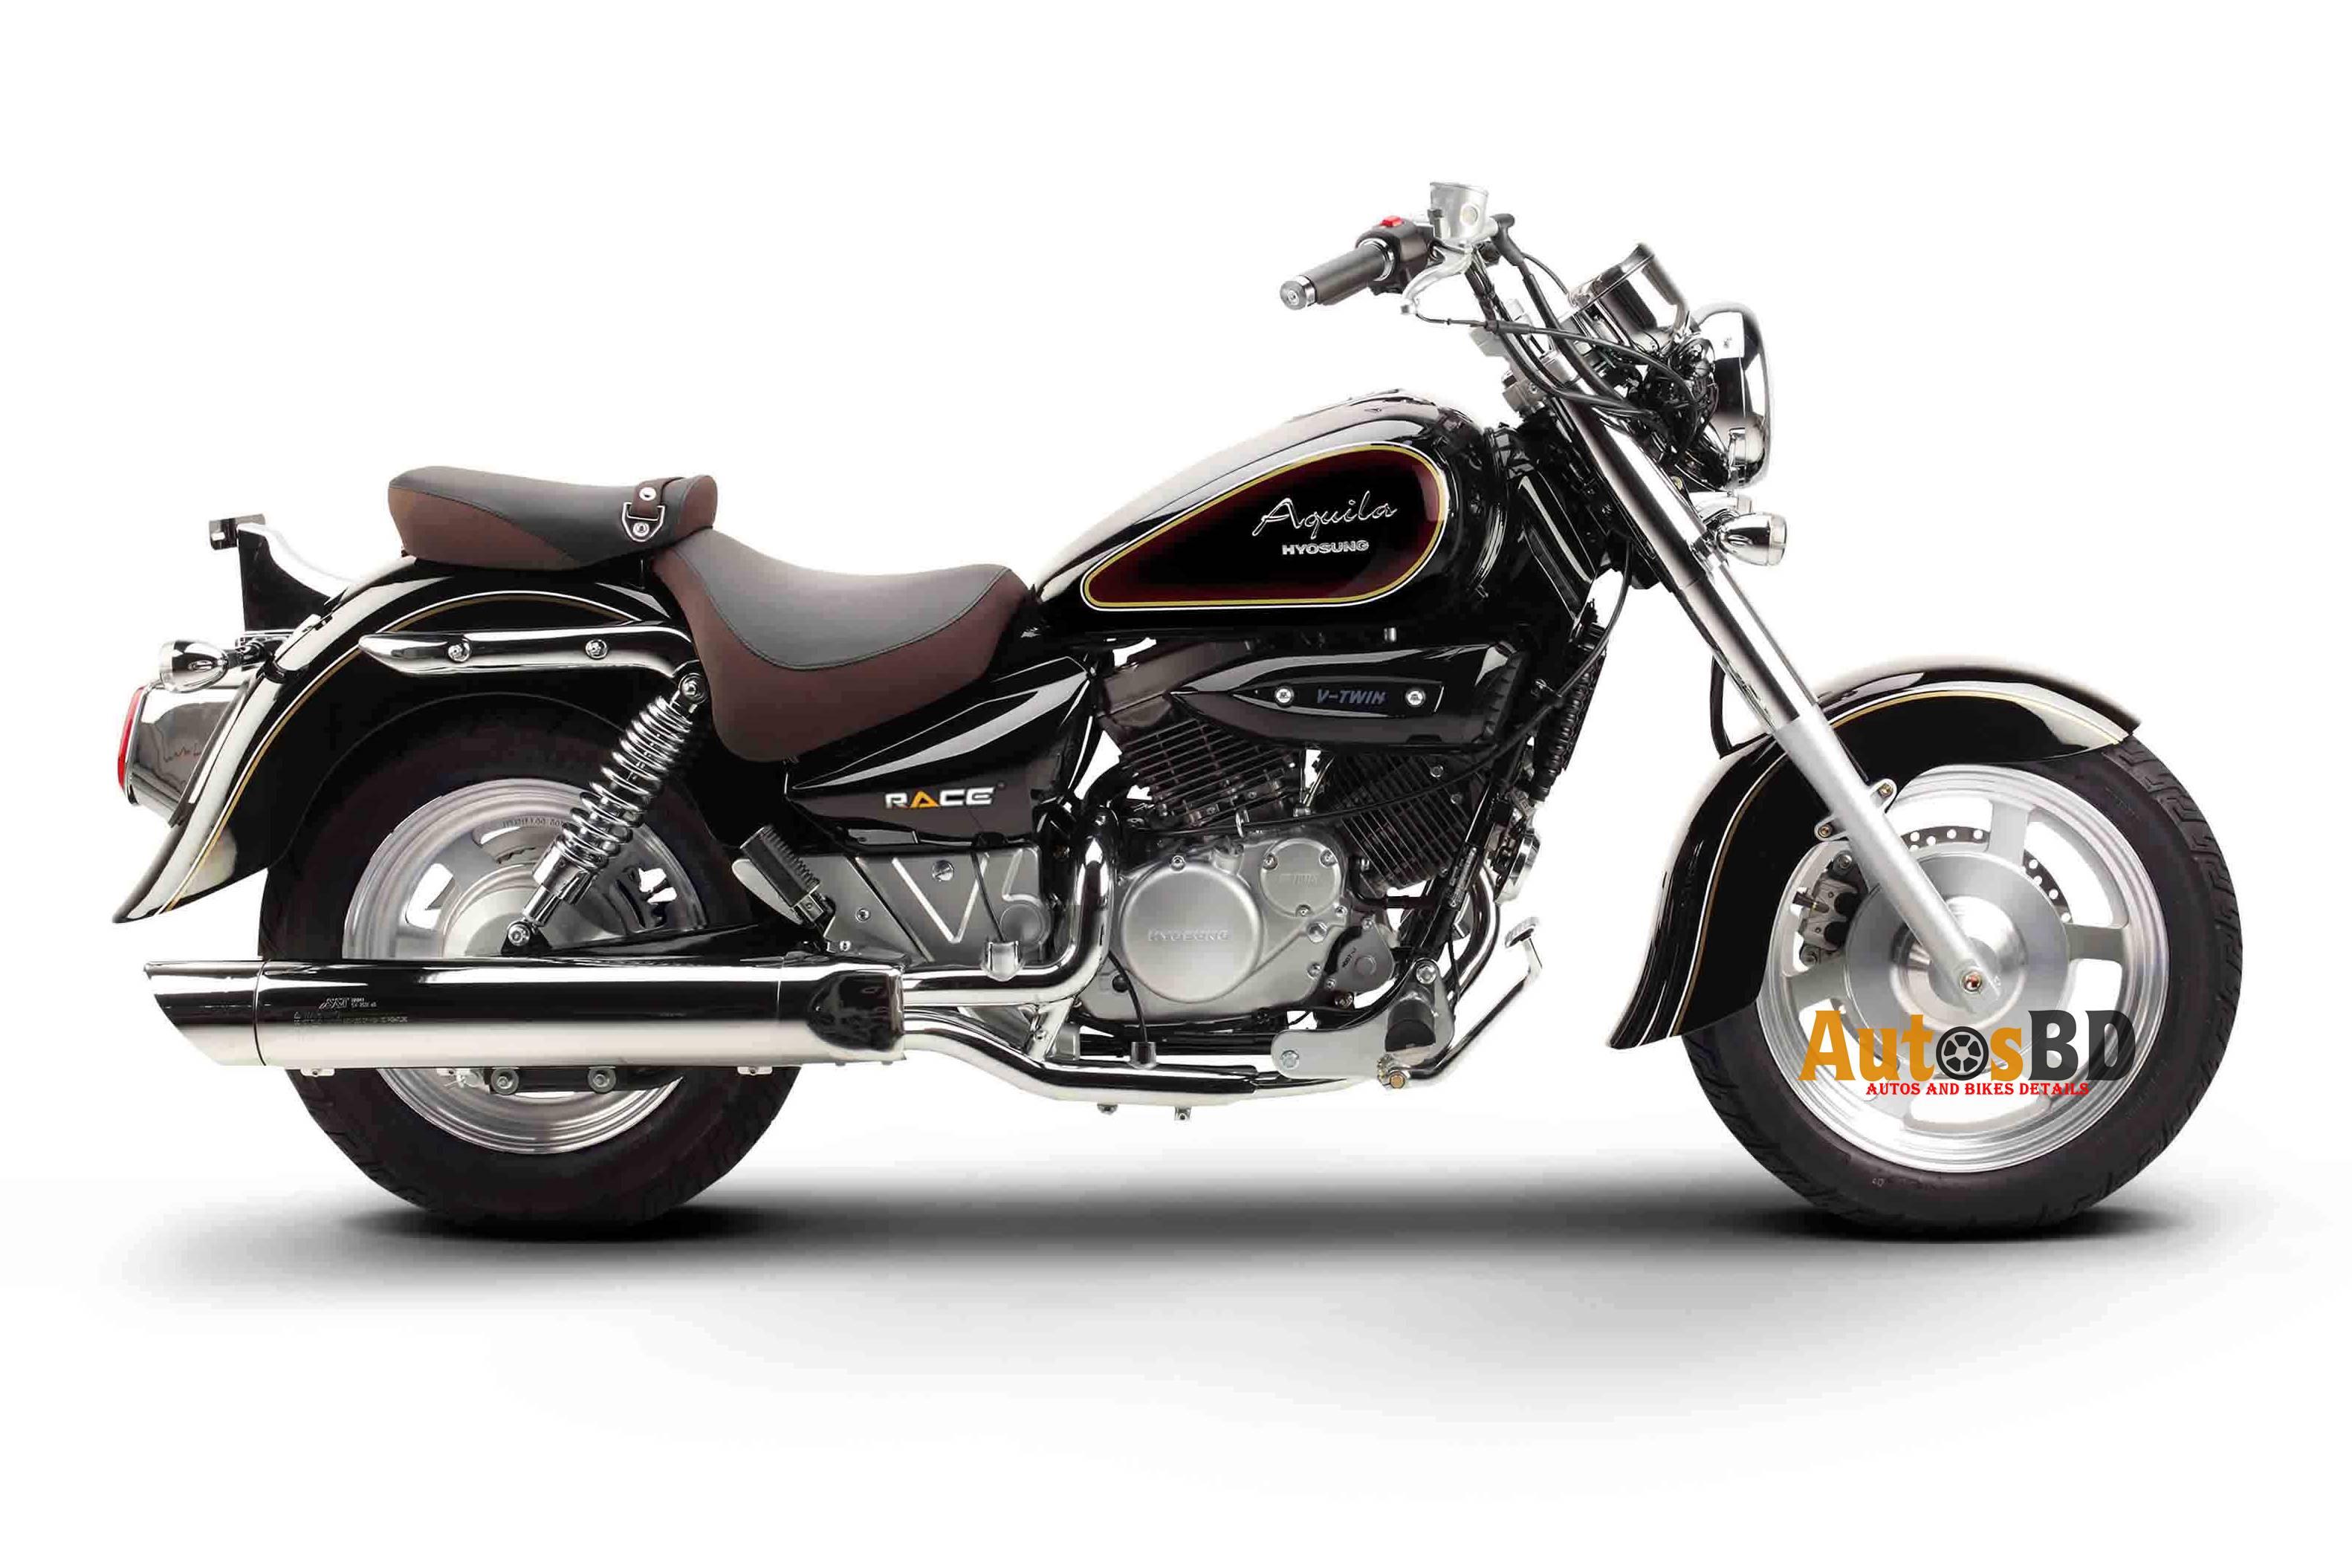 Race Hyosung Aquila 125 Motorcycle Price in Bangladesh